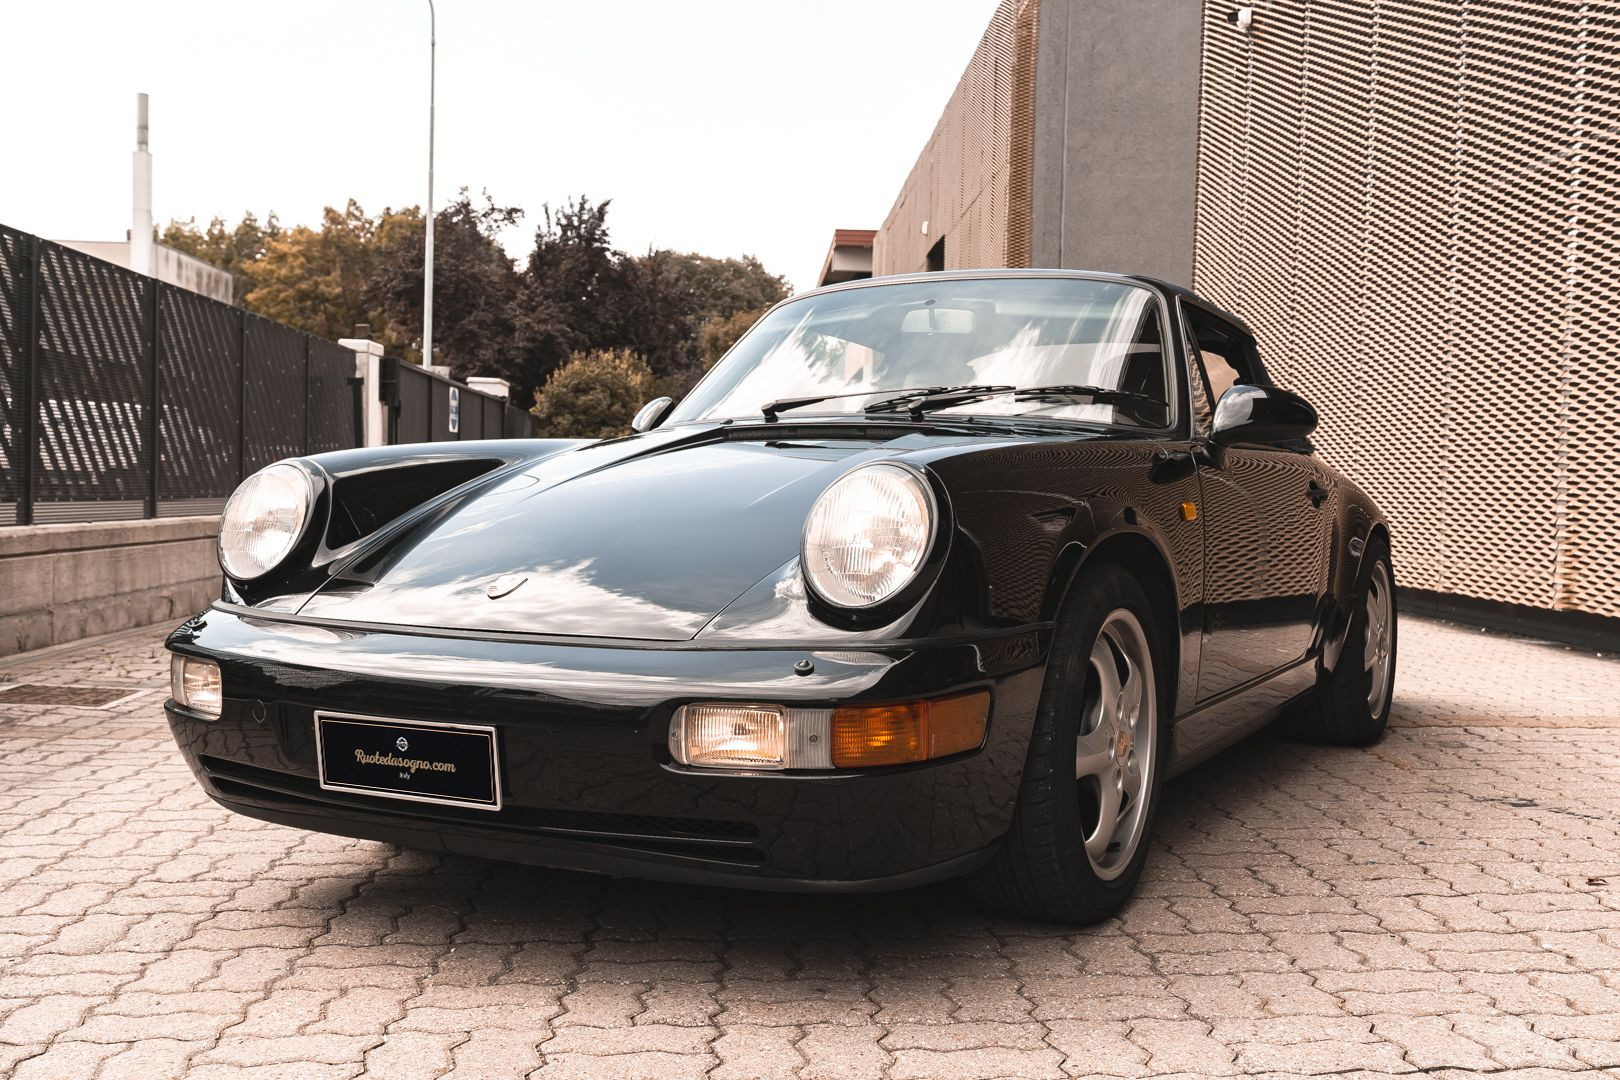 1991 Porsche 911/964 Carrera 4 79223